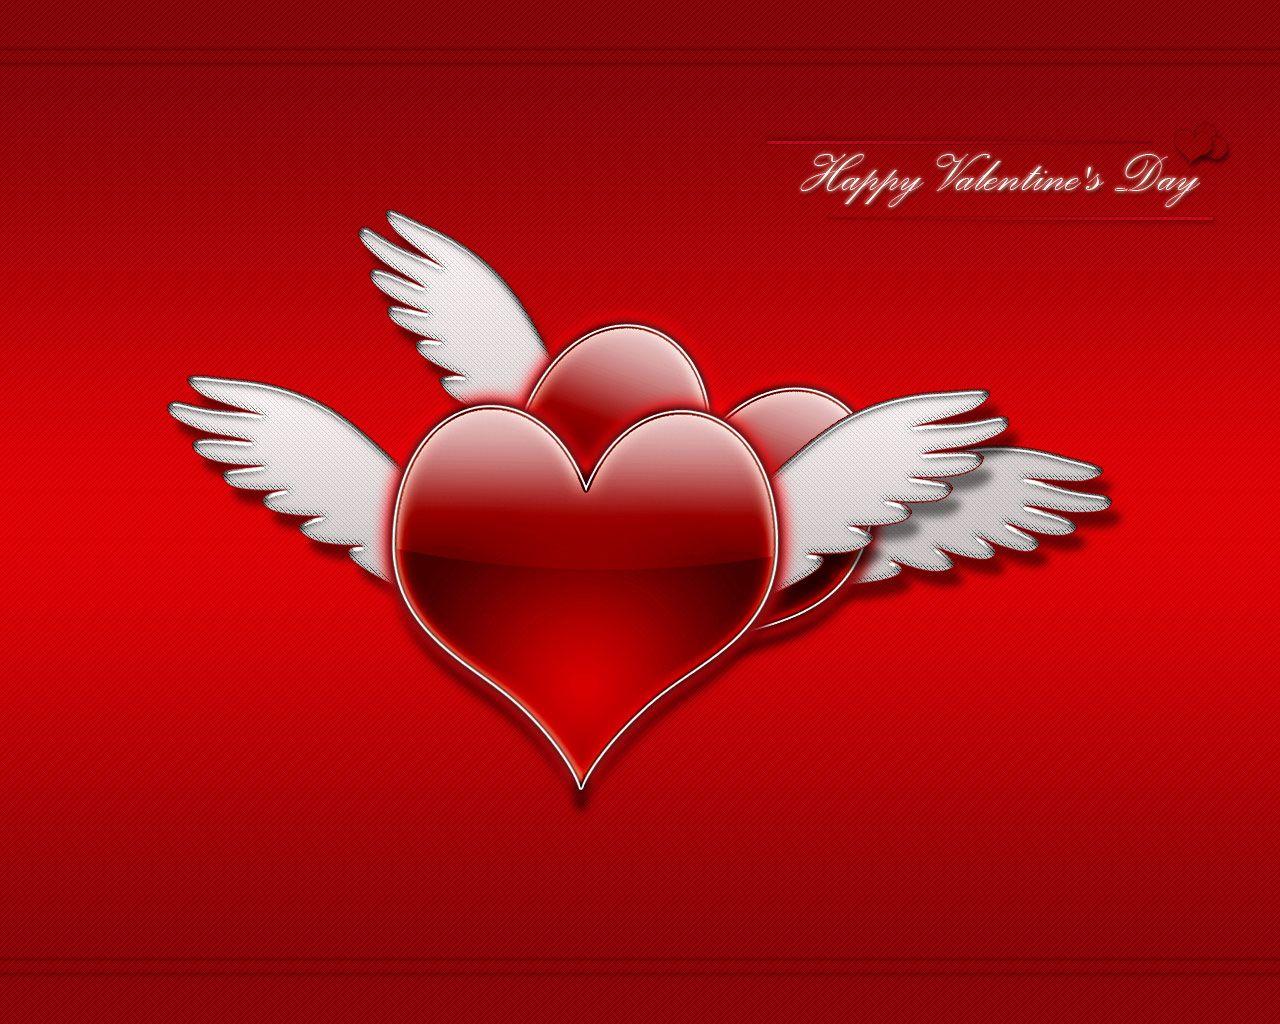 Wallpaperfreeks Happy Valentines Day